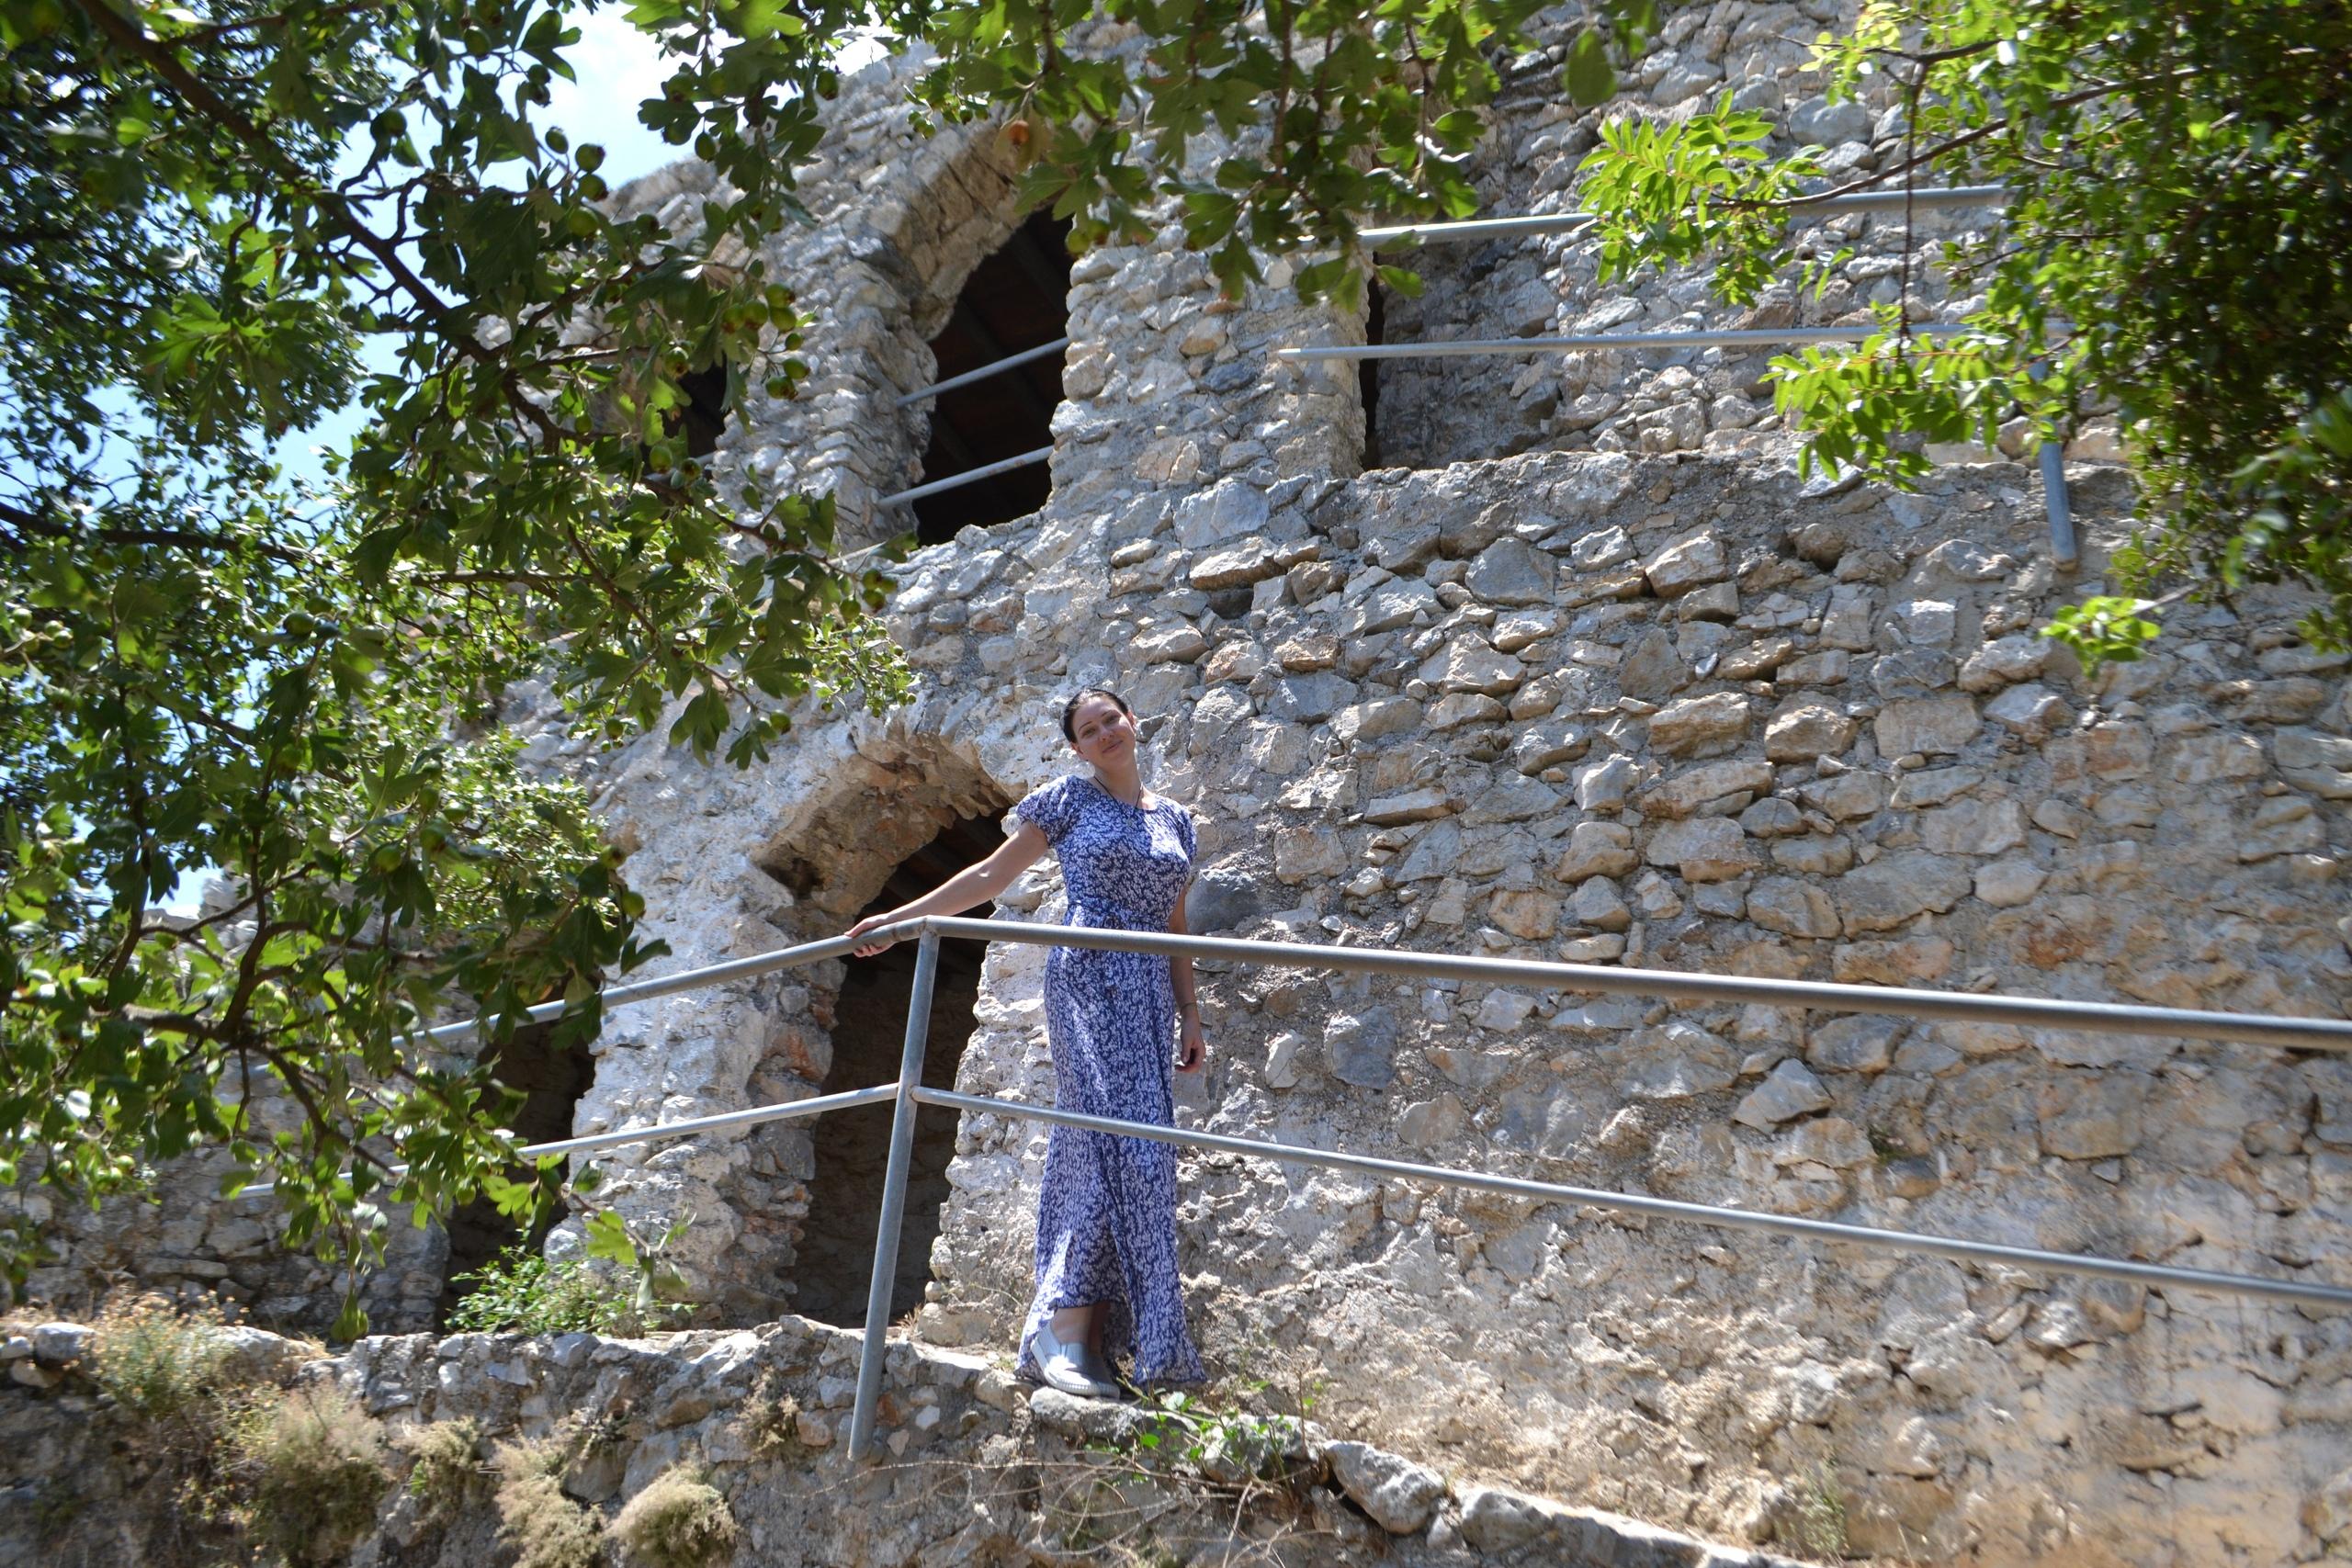 Северный Кипр. Замок Святого Иллариона. (фото). RPQnF5LY0Bc